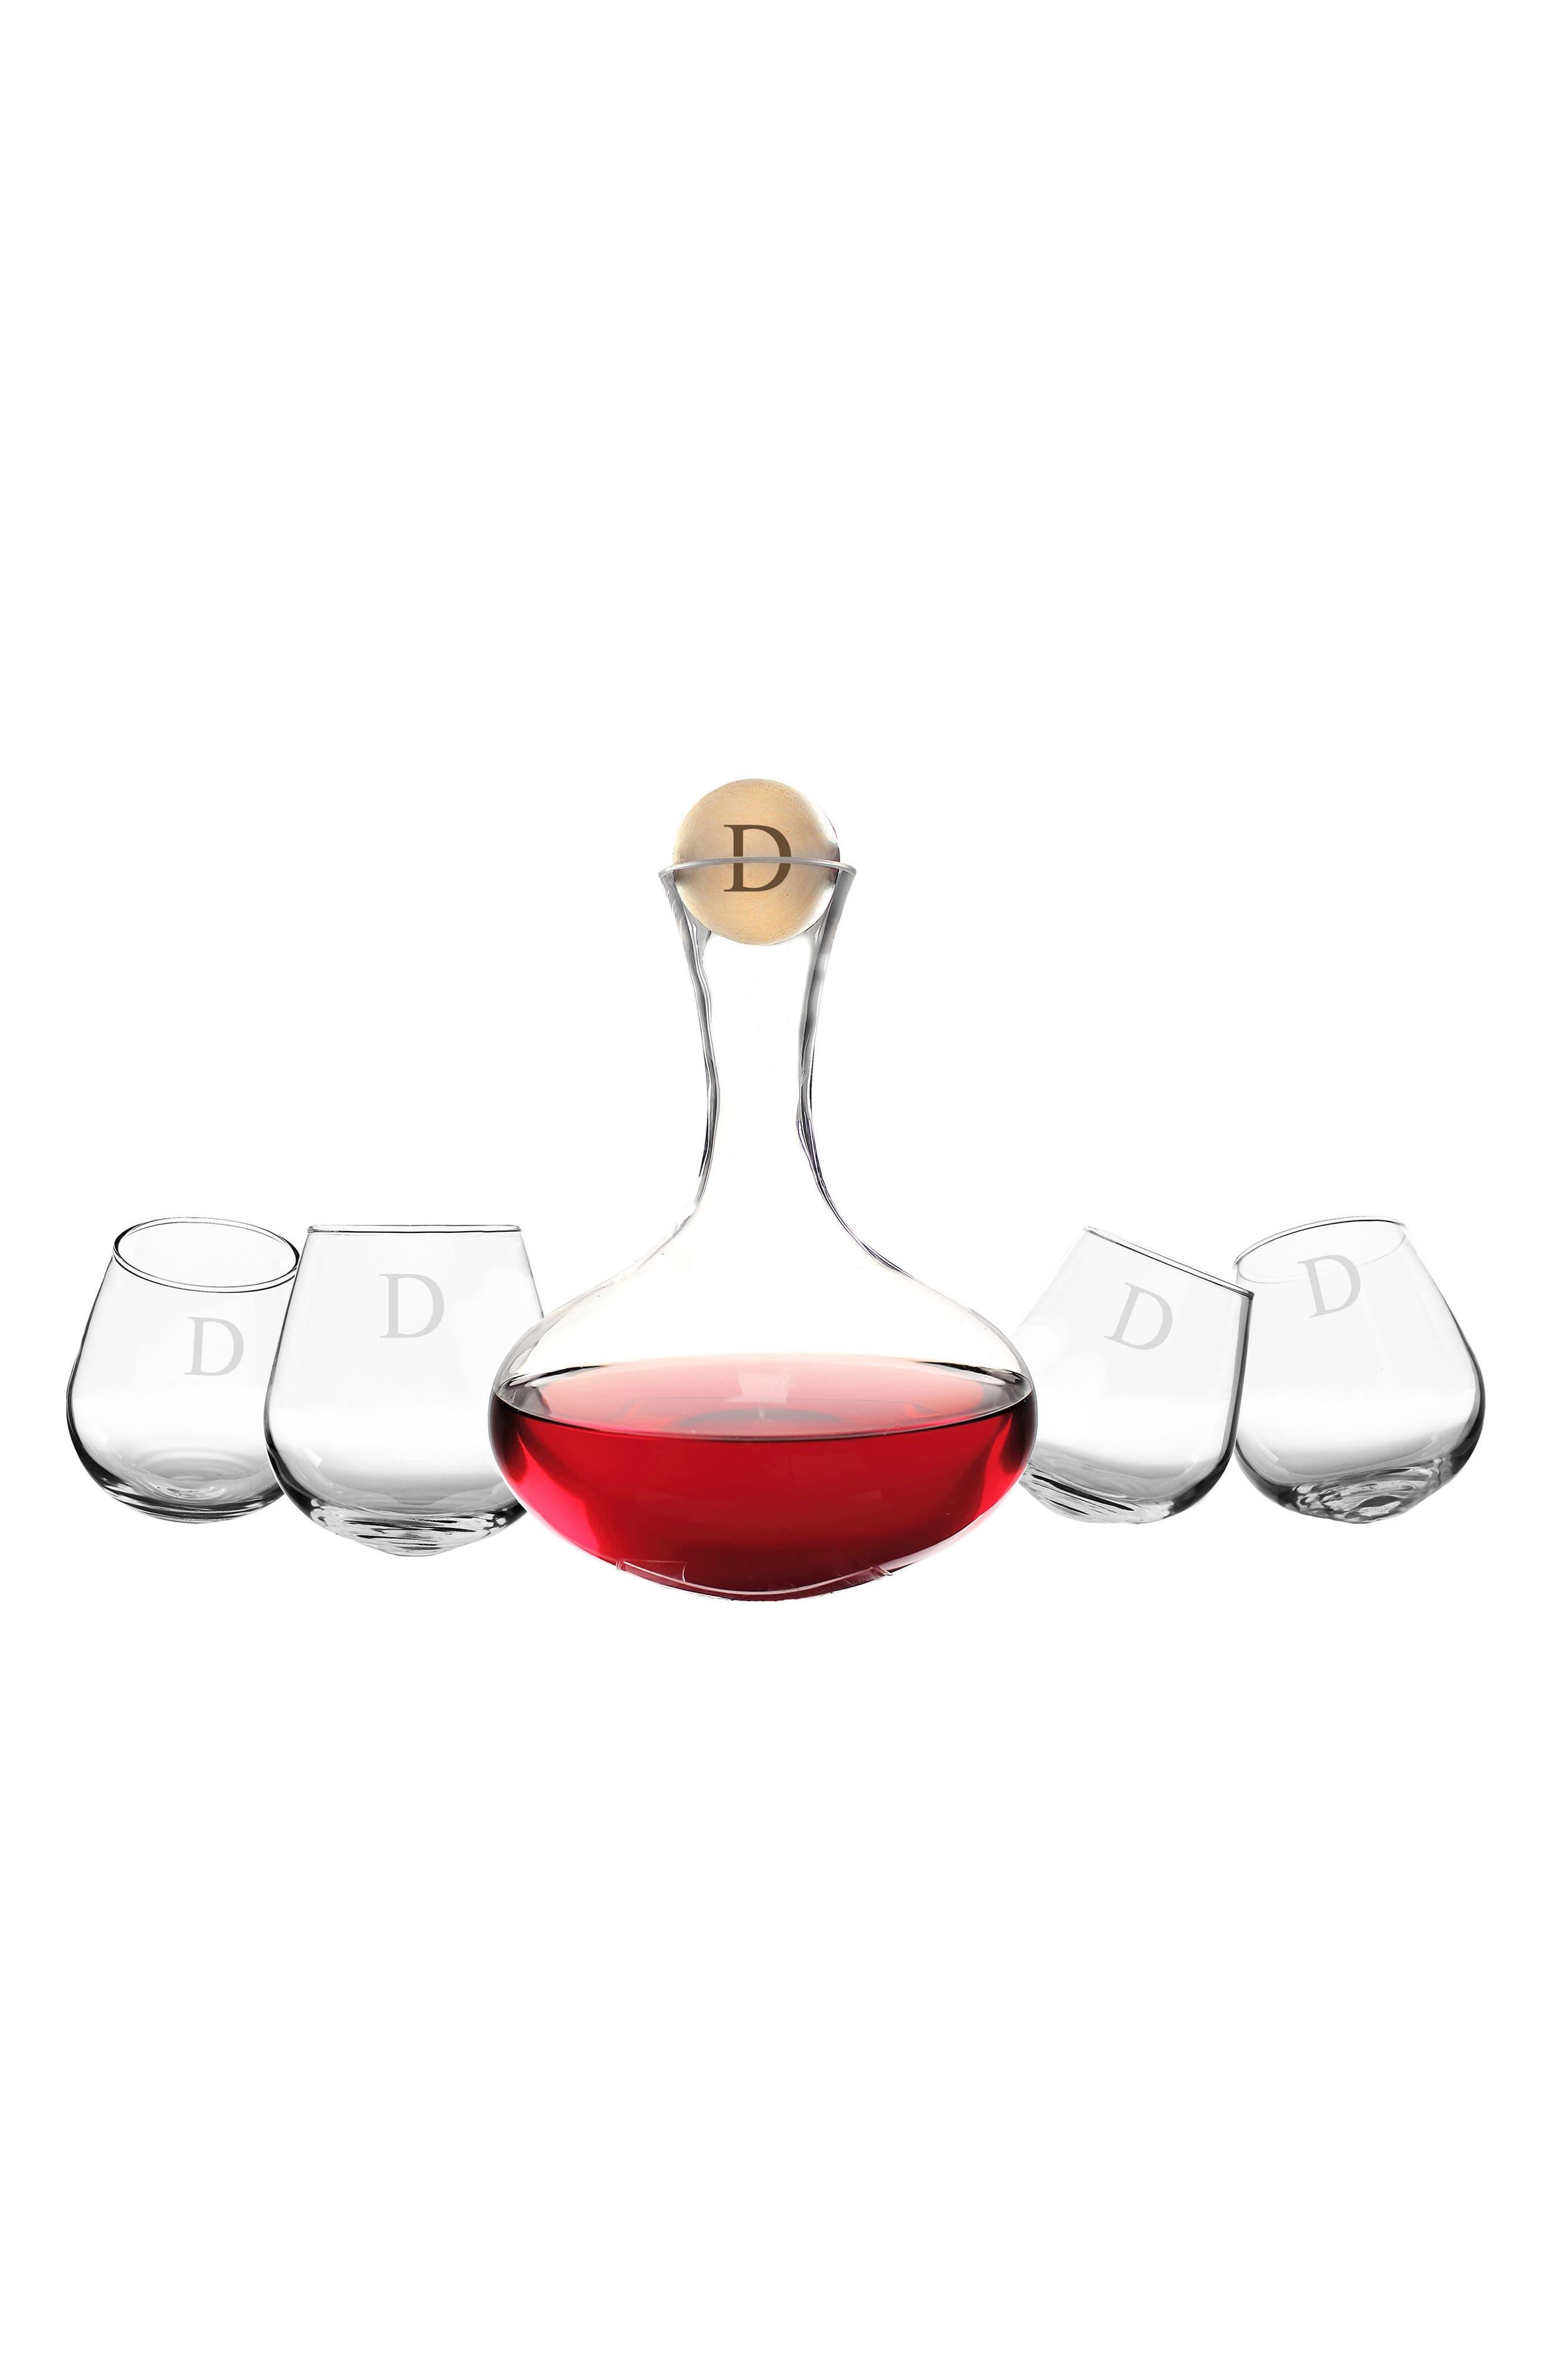 'Tipsy' Monogram Wine Decanter & Stemless Glasses,                             Main thumbnail 1, color,                             D